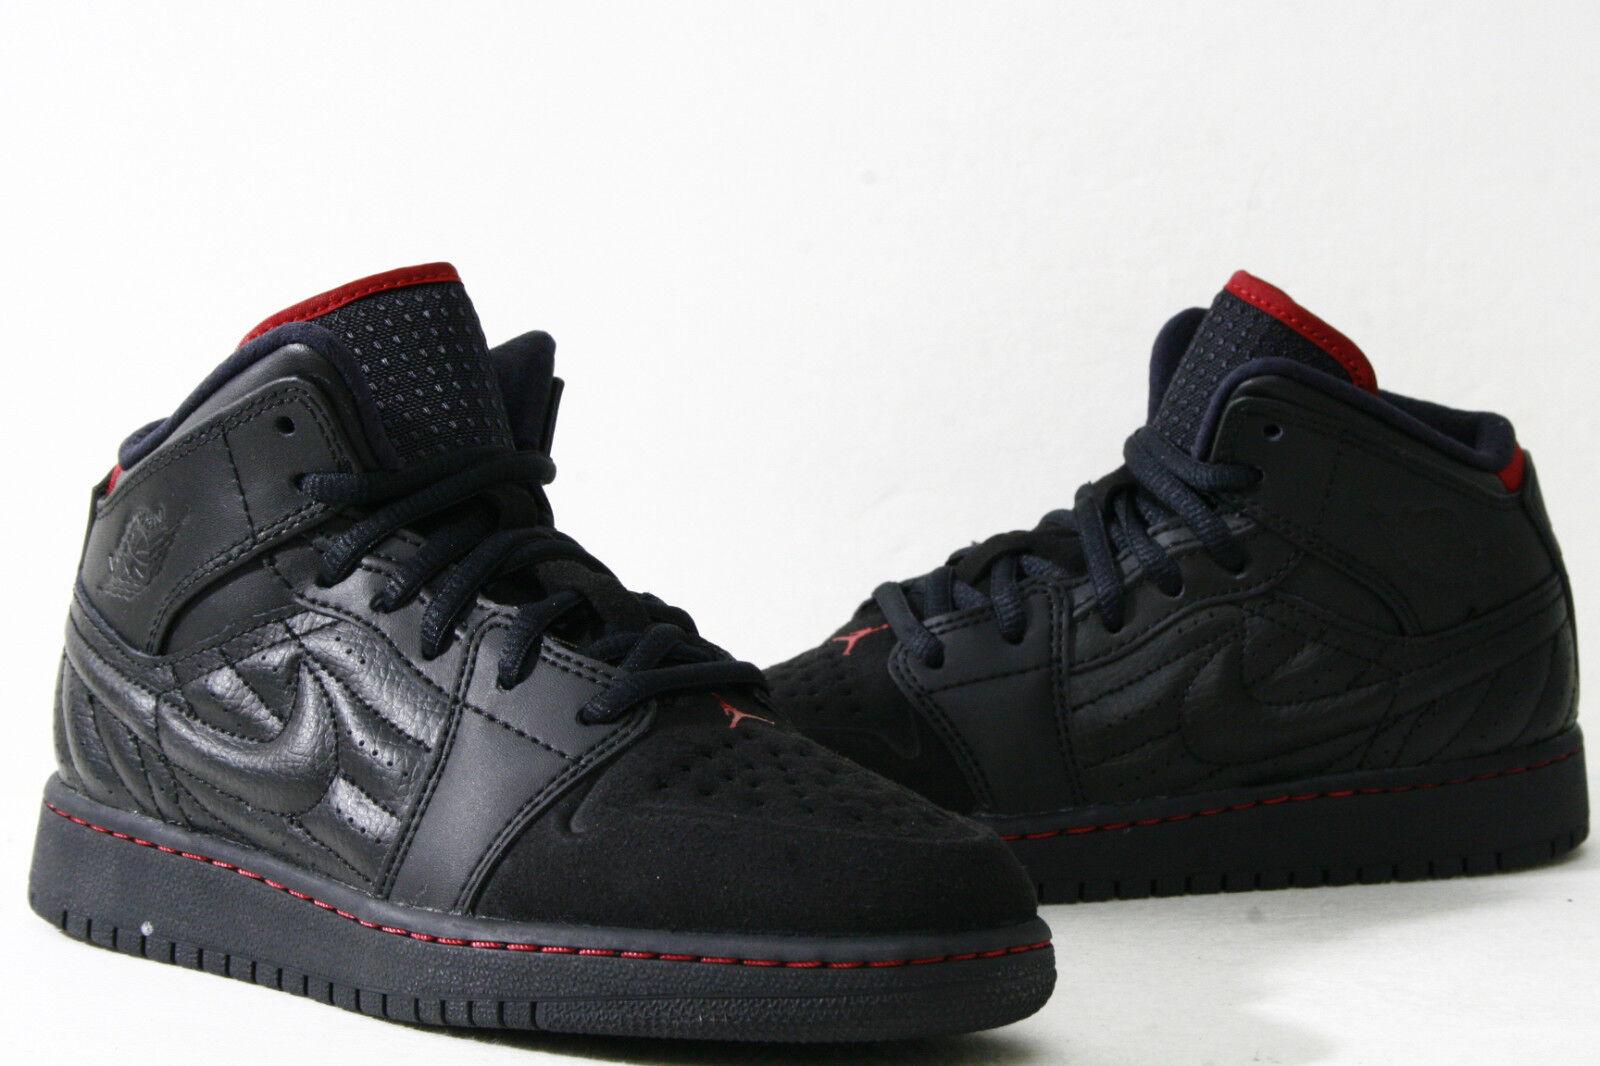 Nike Youth shoes Air Jordan 1 Retro '99 BG (GS) (GS) (GS) shoes 654962-001 Youth Size 4 cc65e4